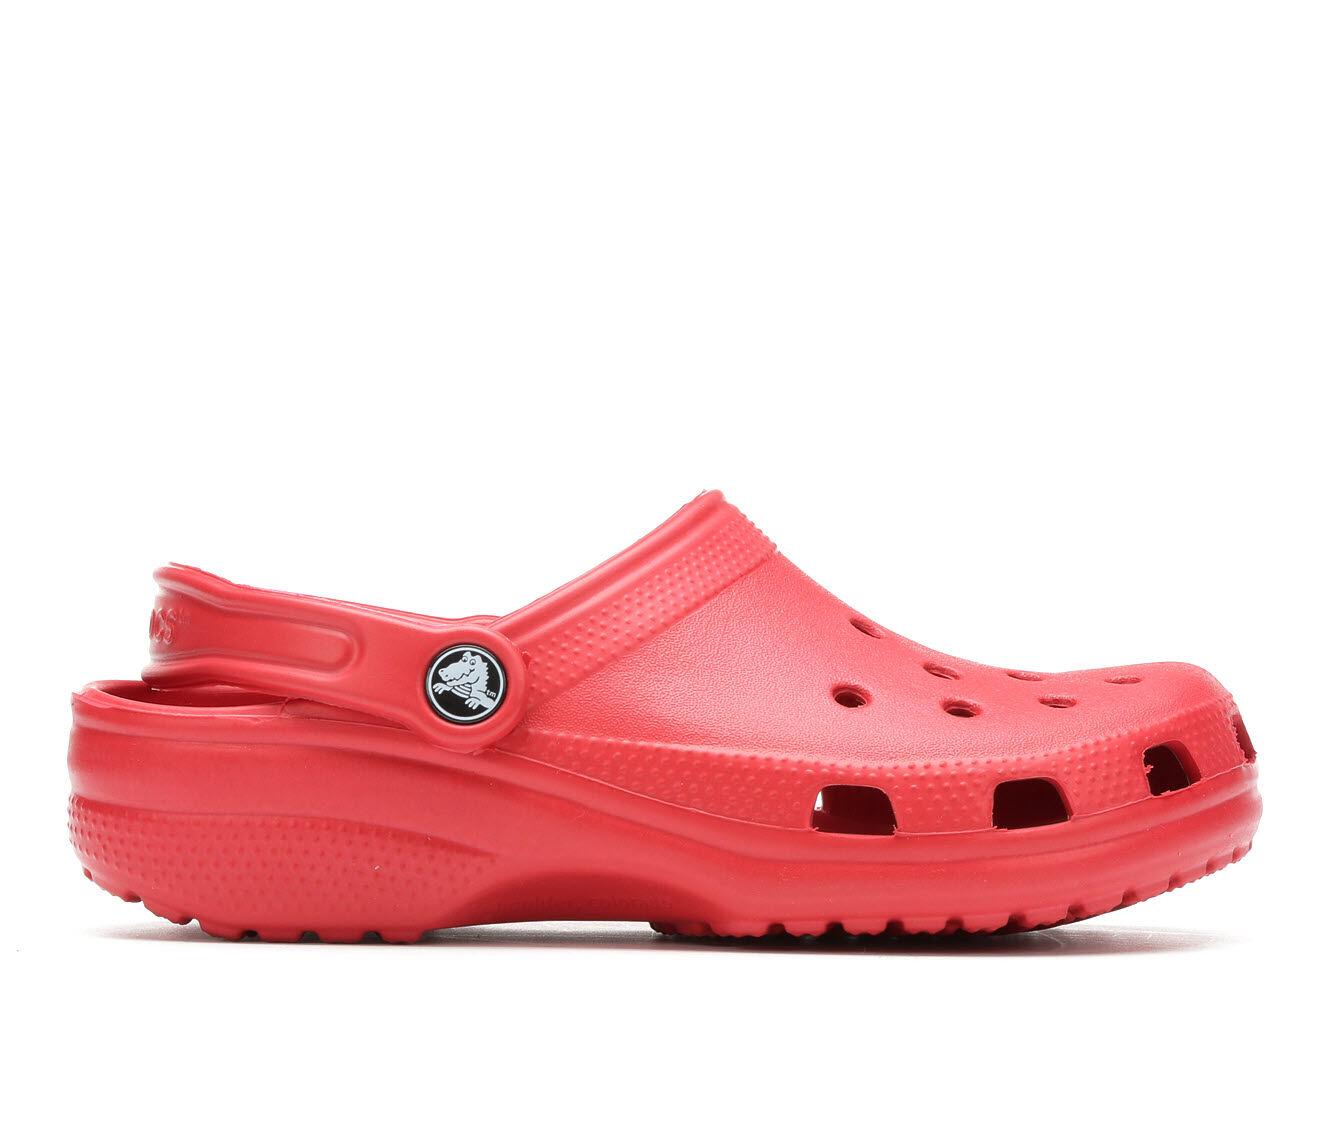 Women's Crocs Classic Clogs Pepper